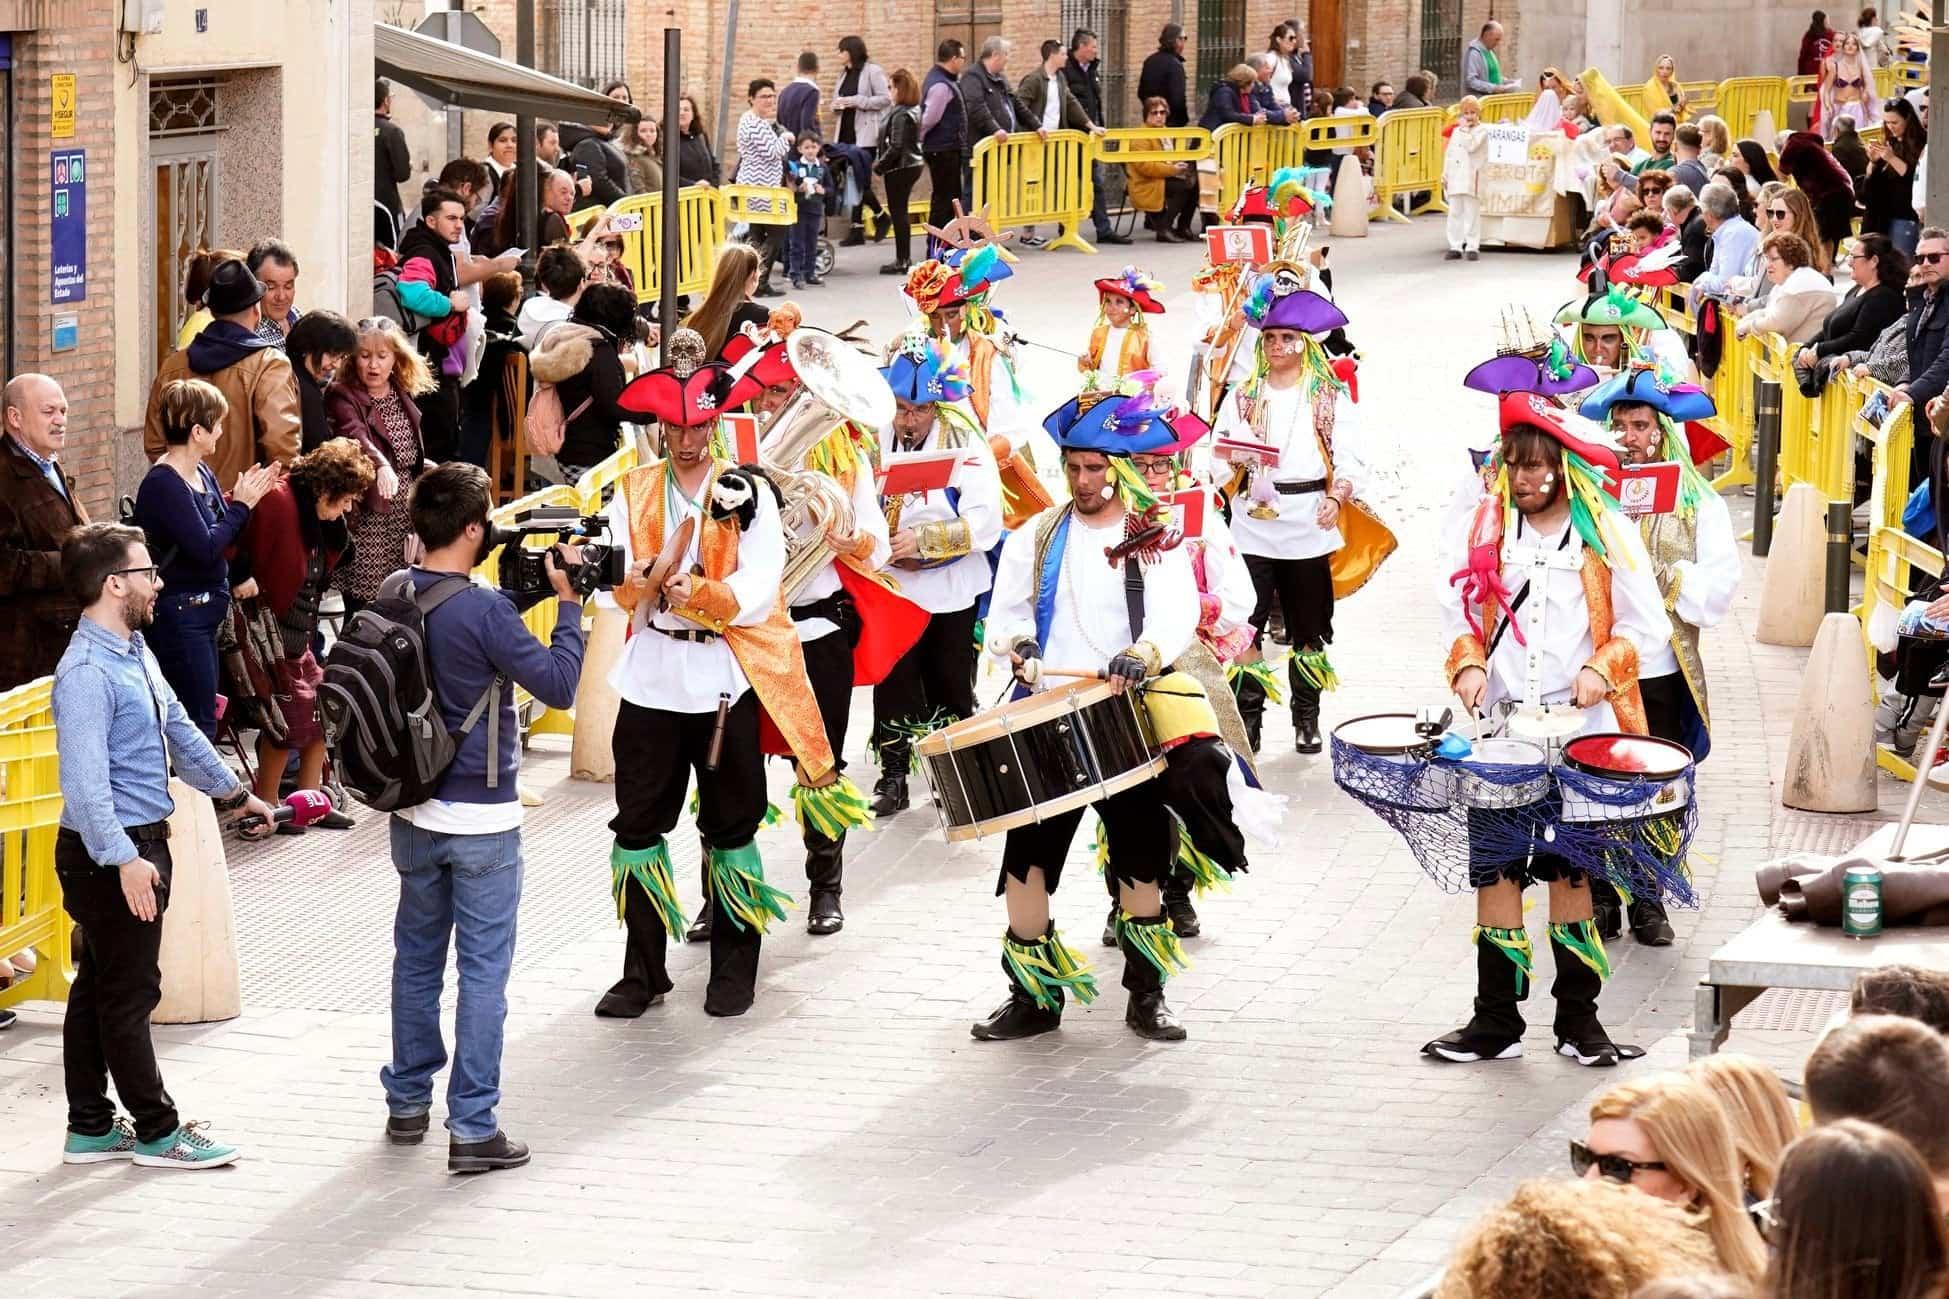 Carnaval de herencia 2020 ofertorio 169 - Selección de fotografías del Ofertorio del Carnaval de Herencia